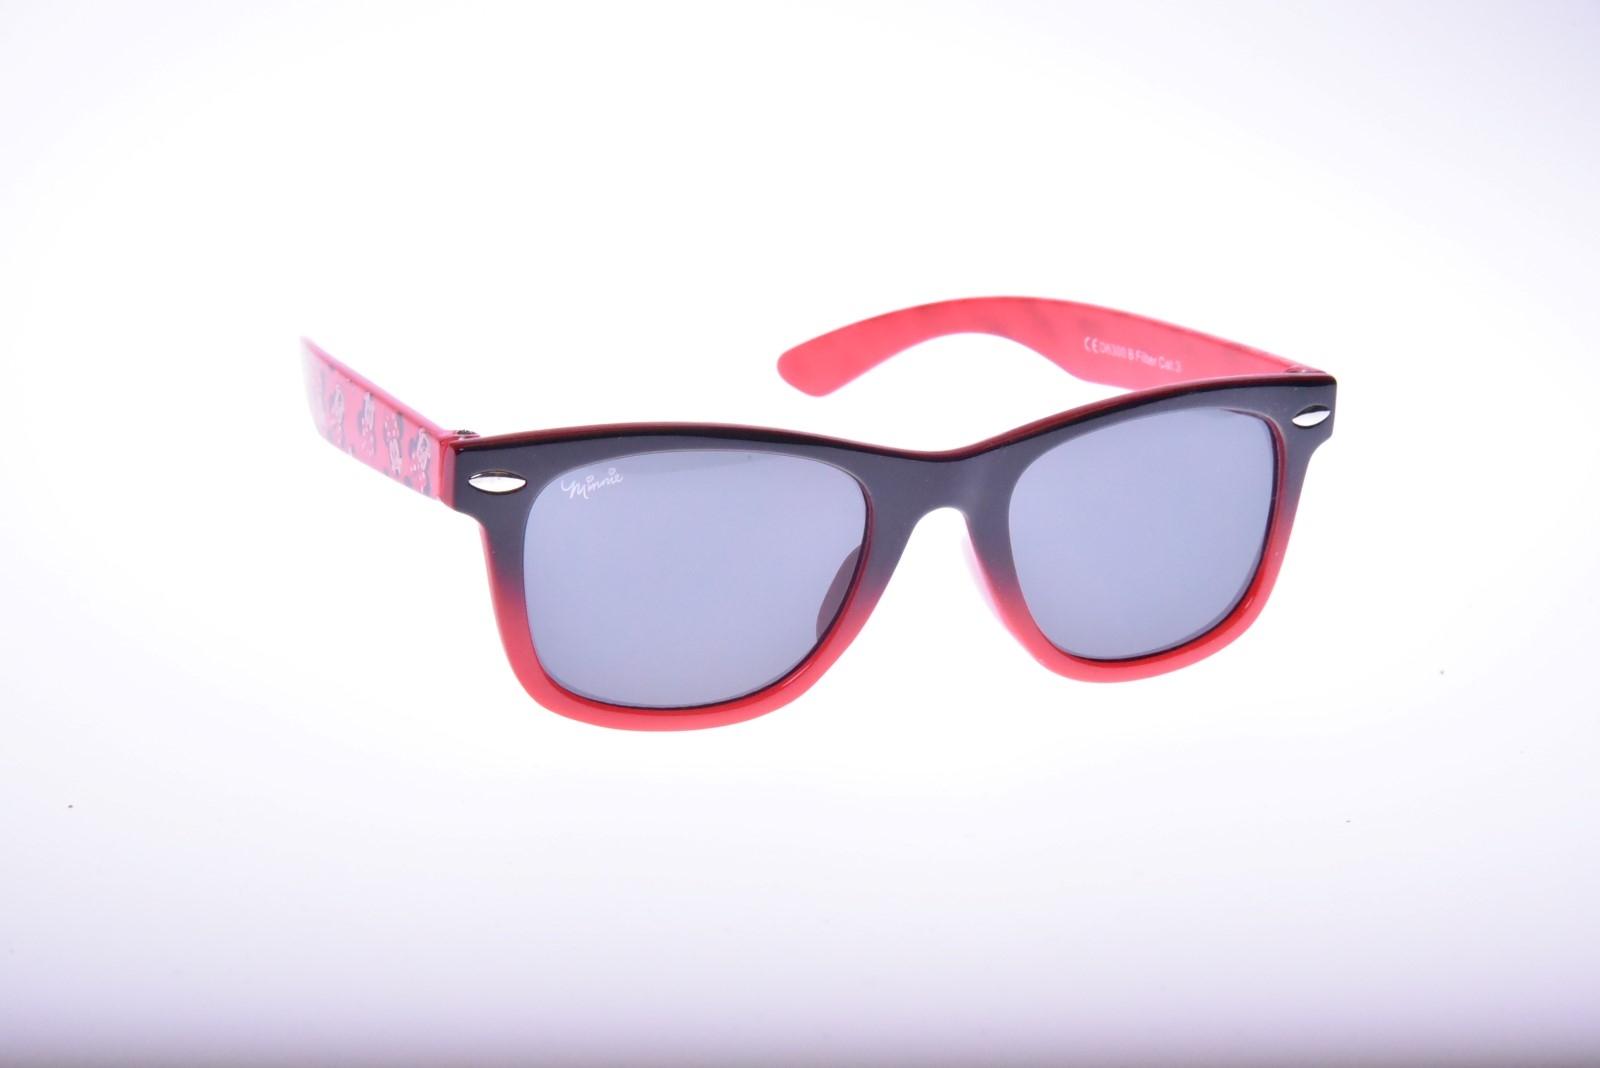 Polaroid Disney D6300B - Slnečné okuliare pre deti 8-12 r.